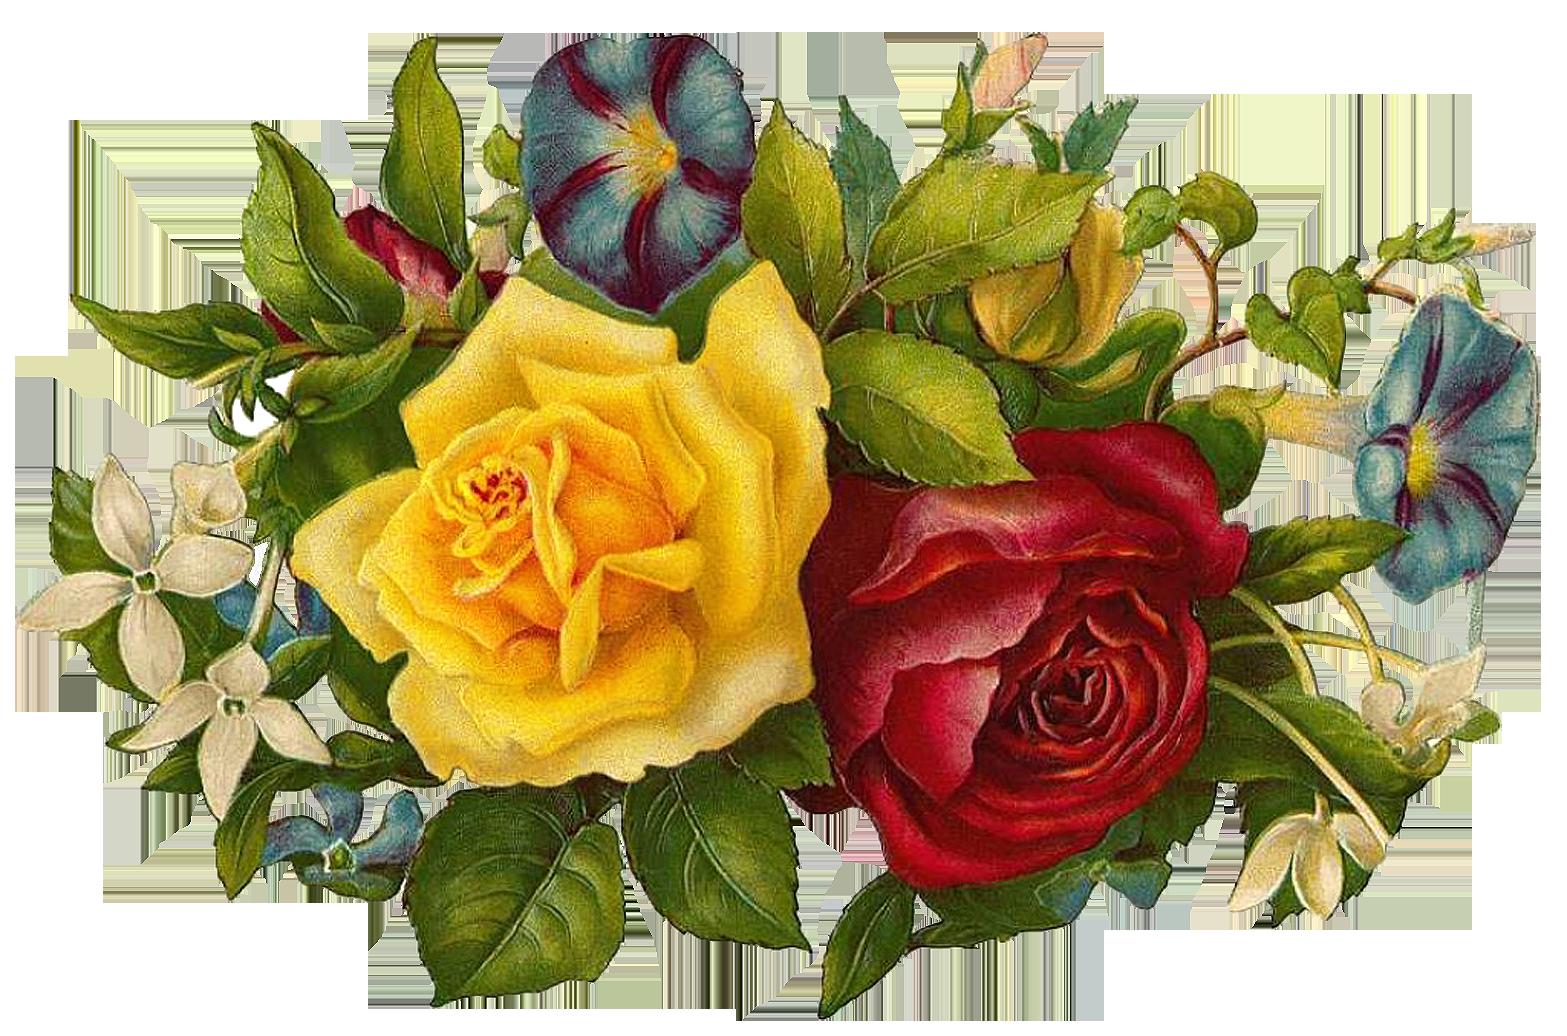 Image free printable images. Flower vintage png